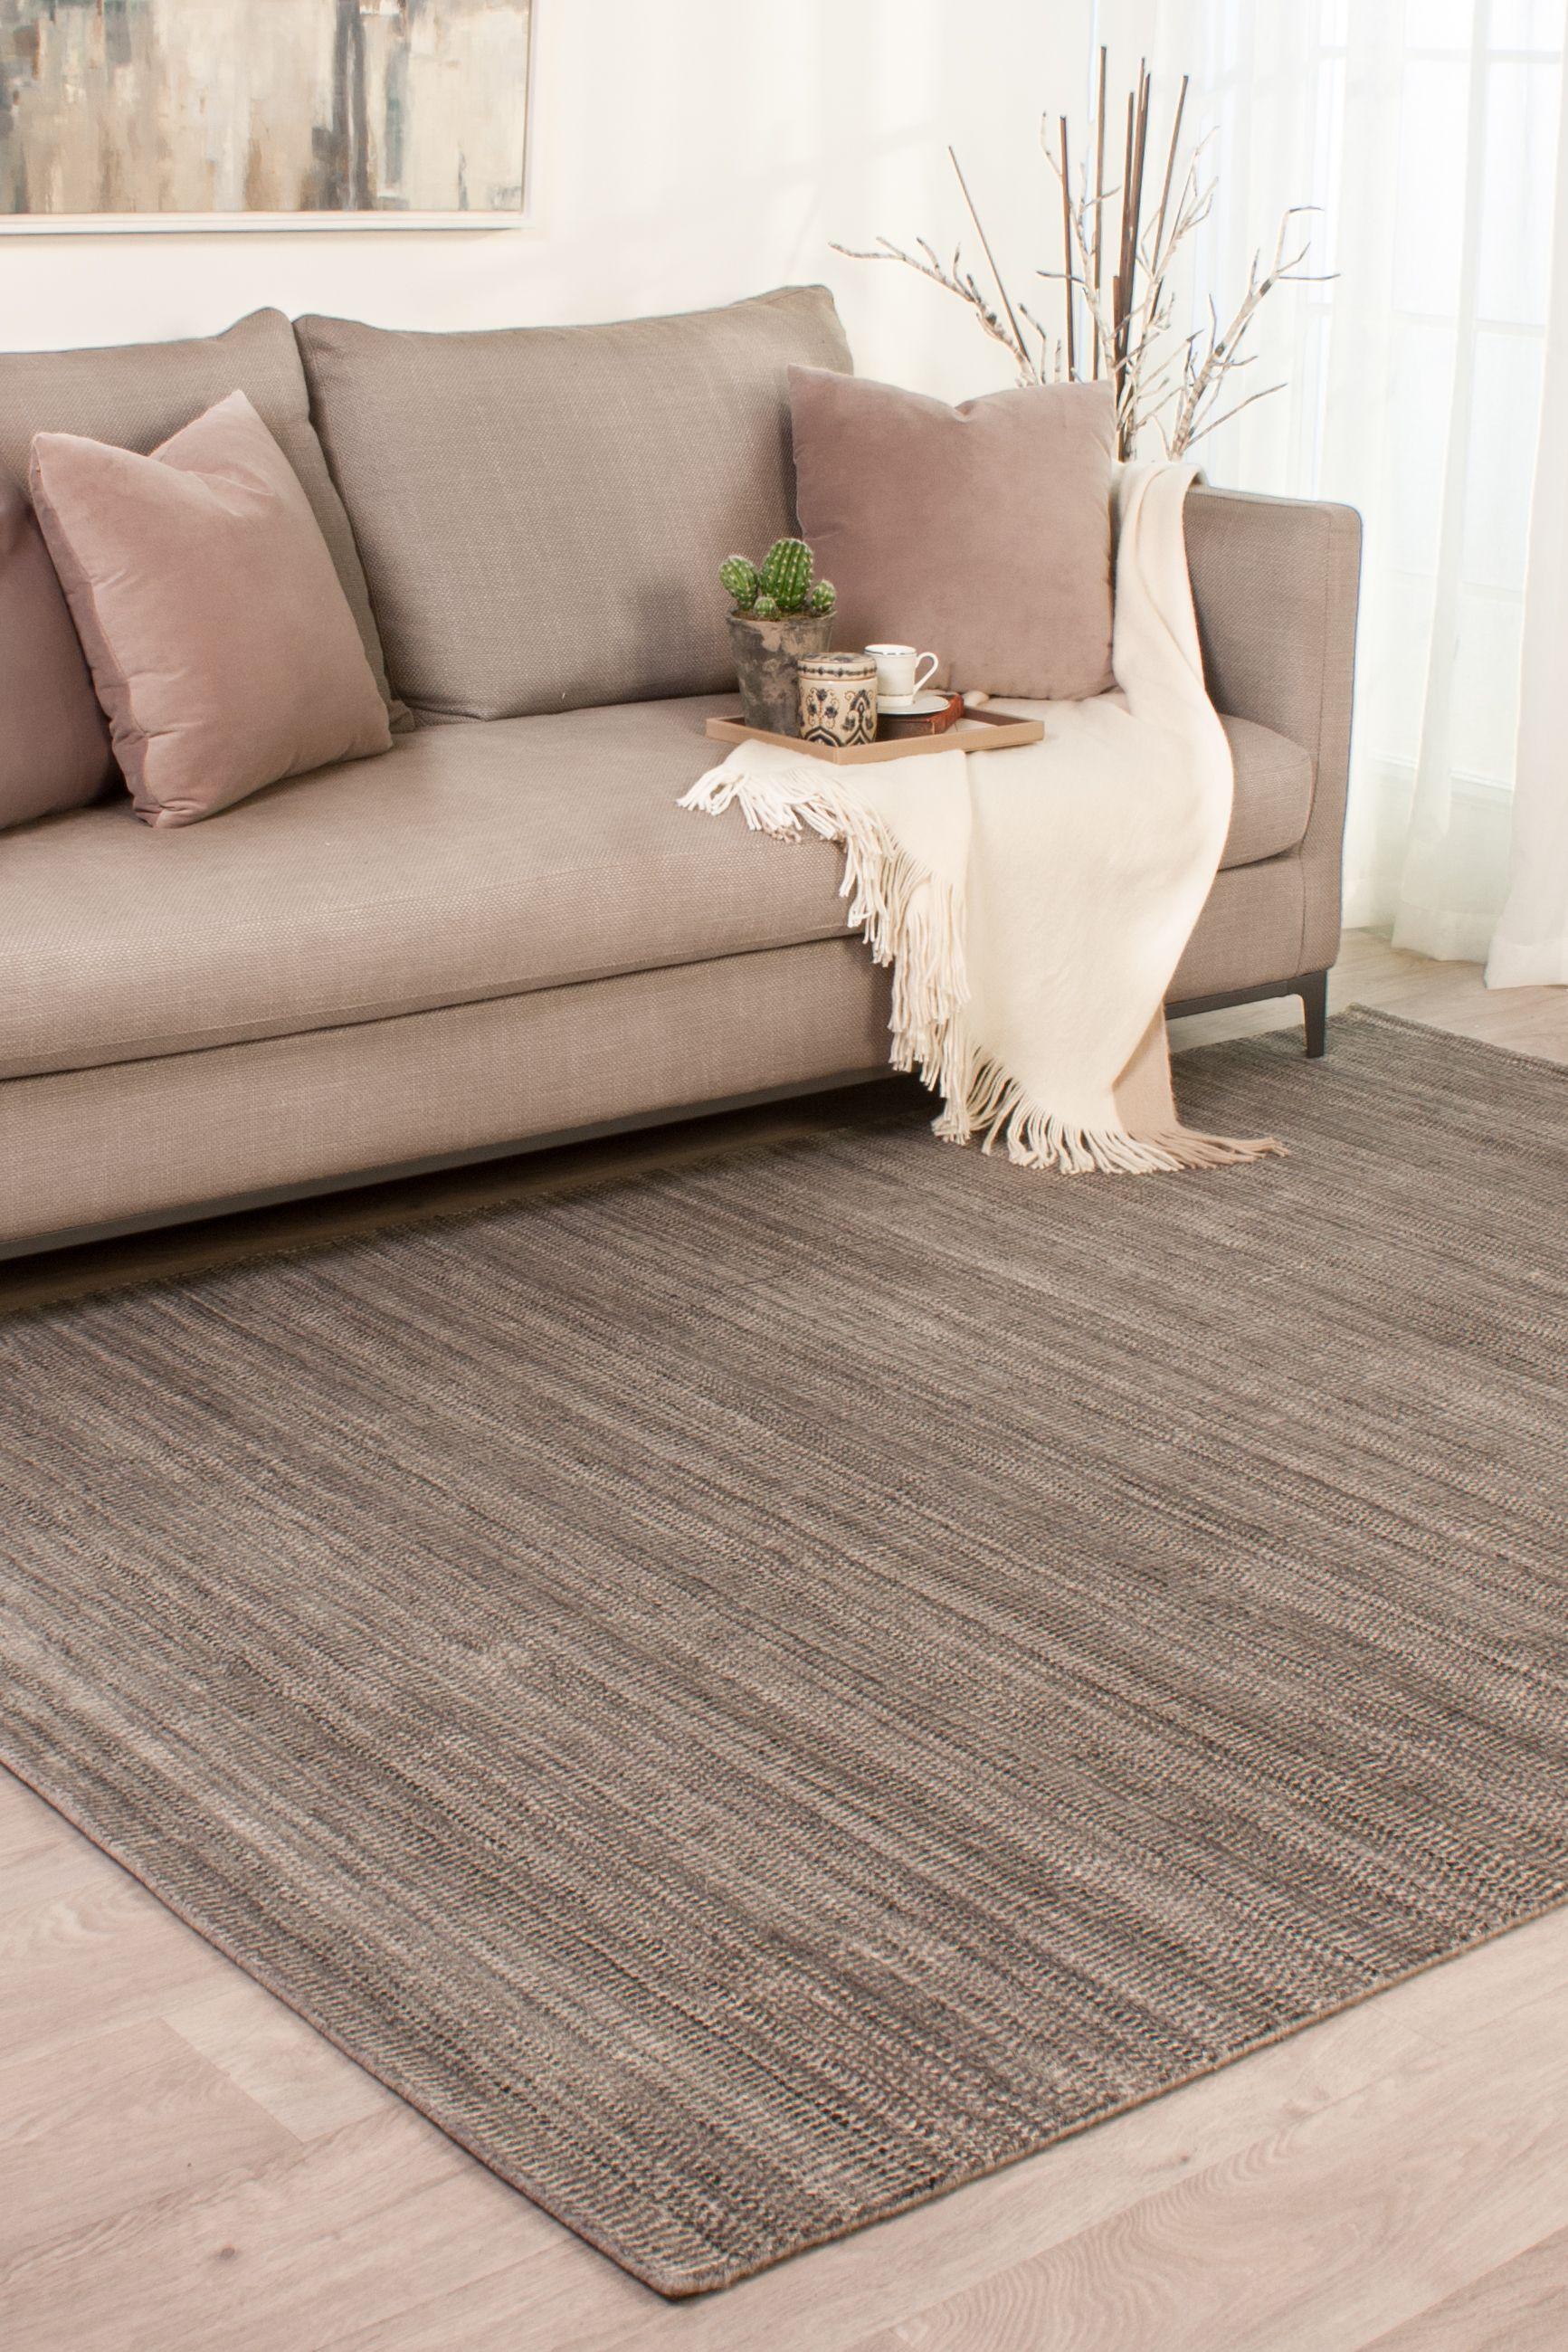 Bh 5blkslvr Contemporary Carpet Rugs In Living Room Modern Rugs